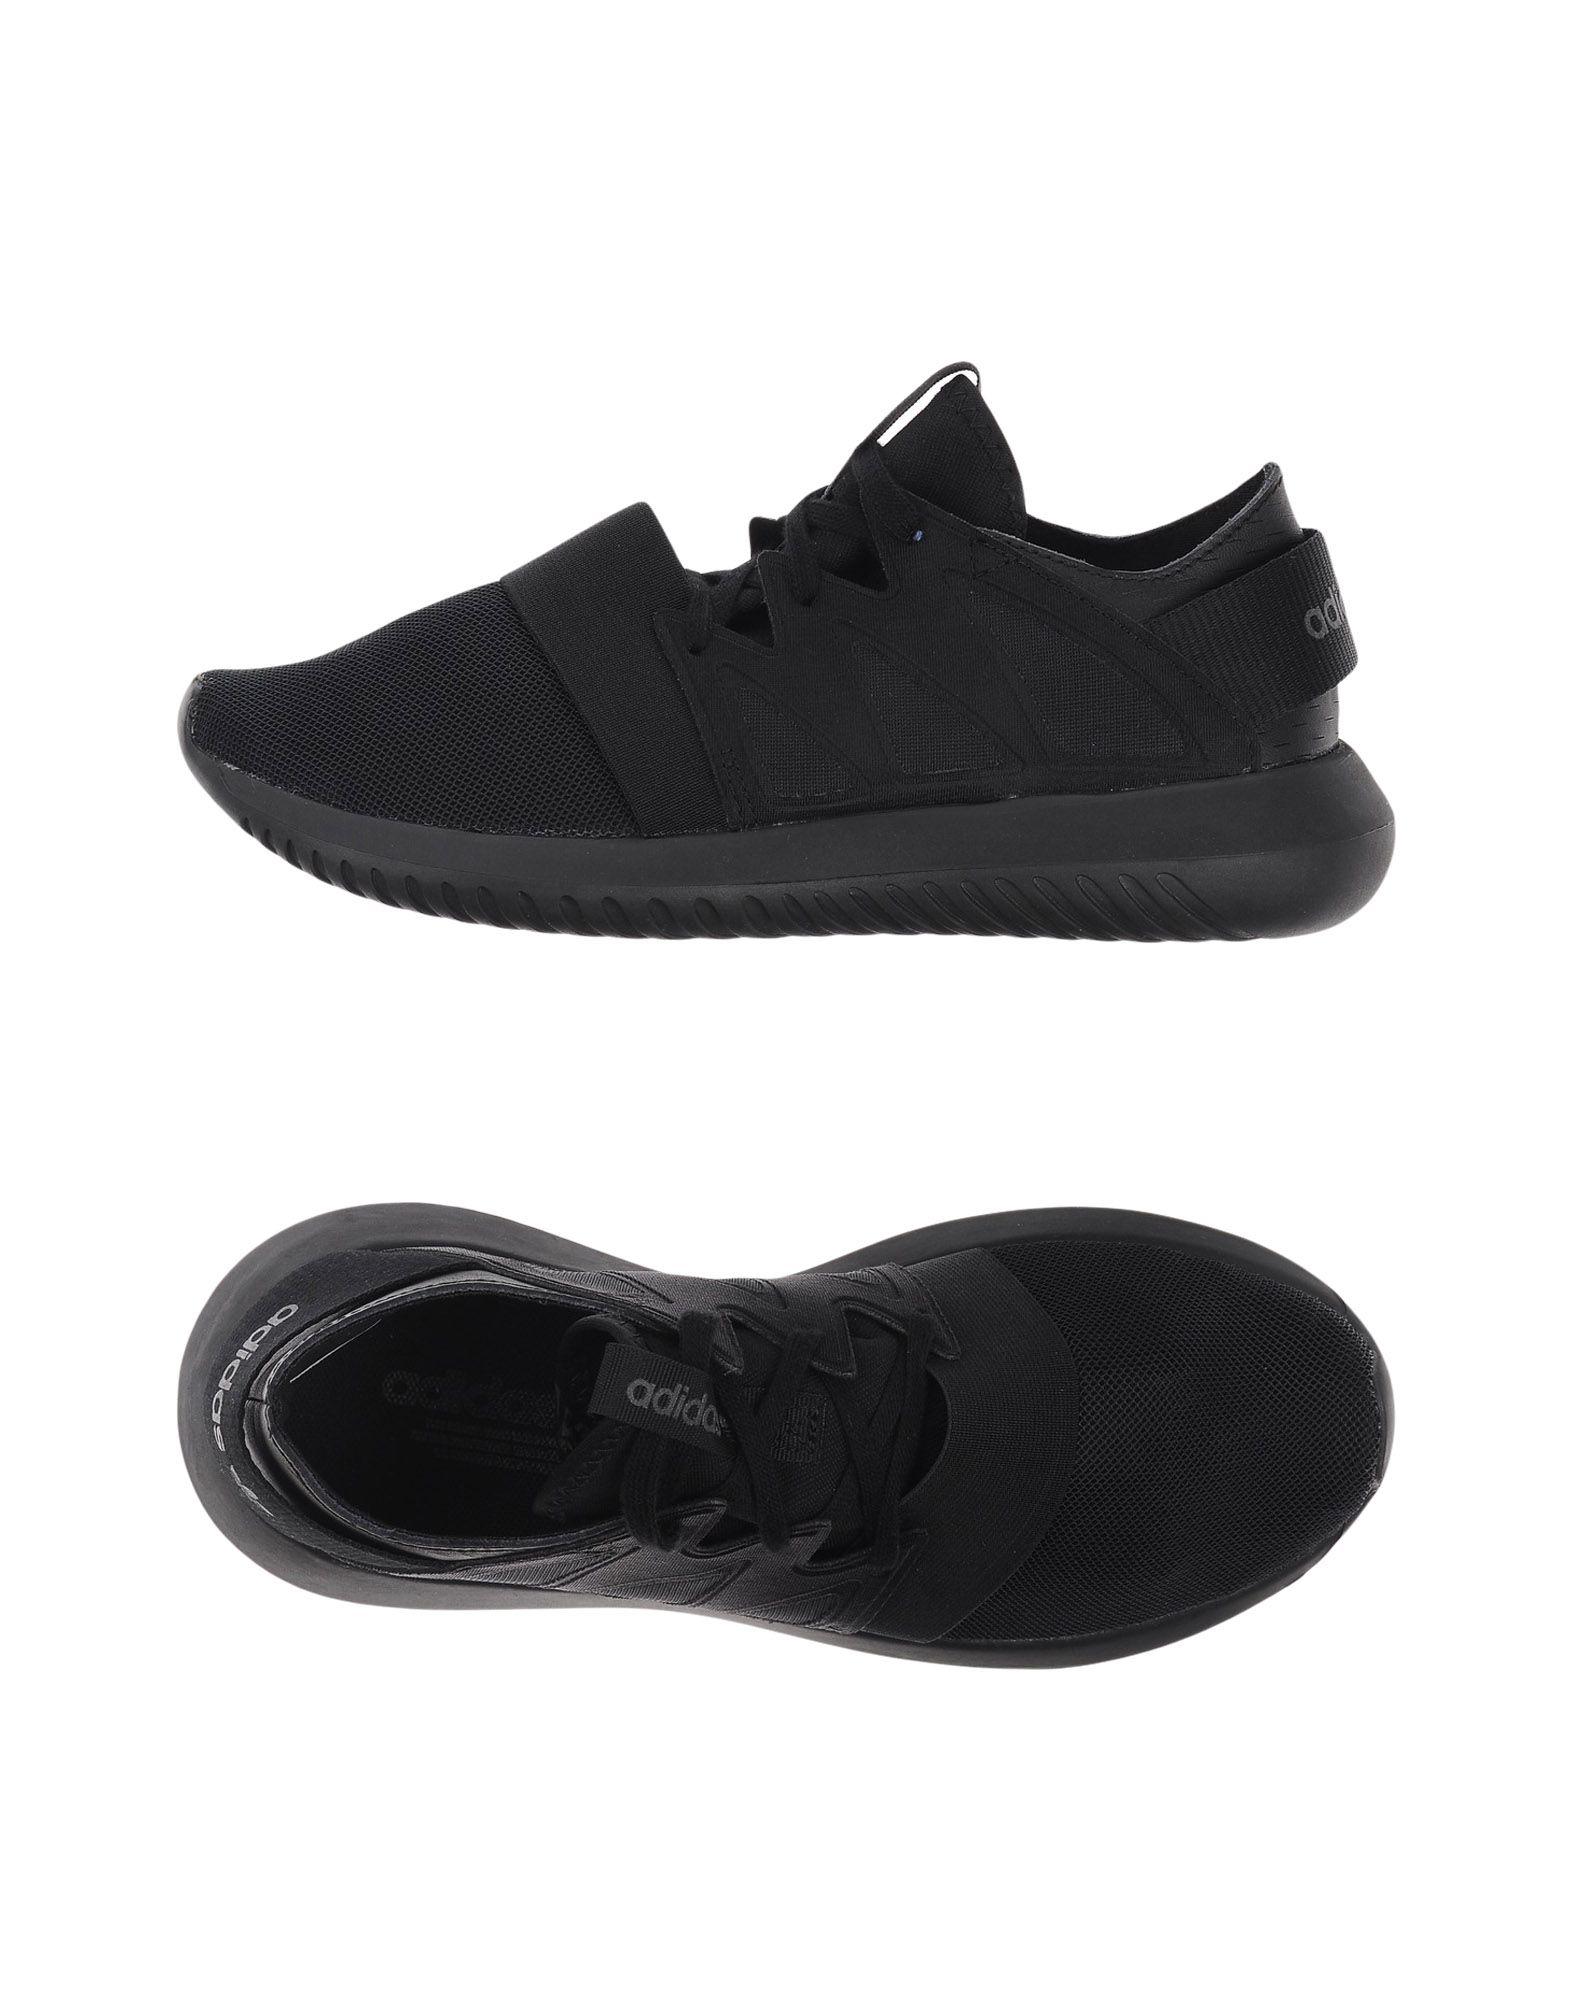 Adidas Originals Originals Adidas Sneakers Damen  11233376UI 3b4051